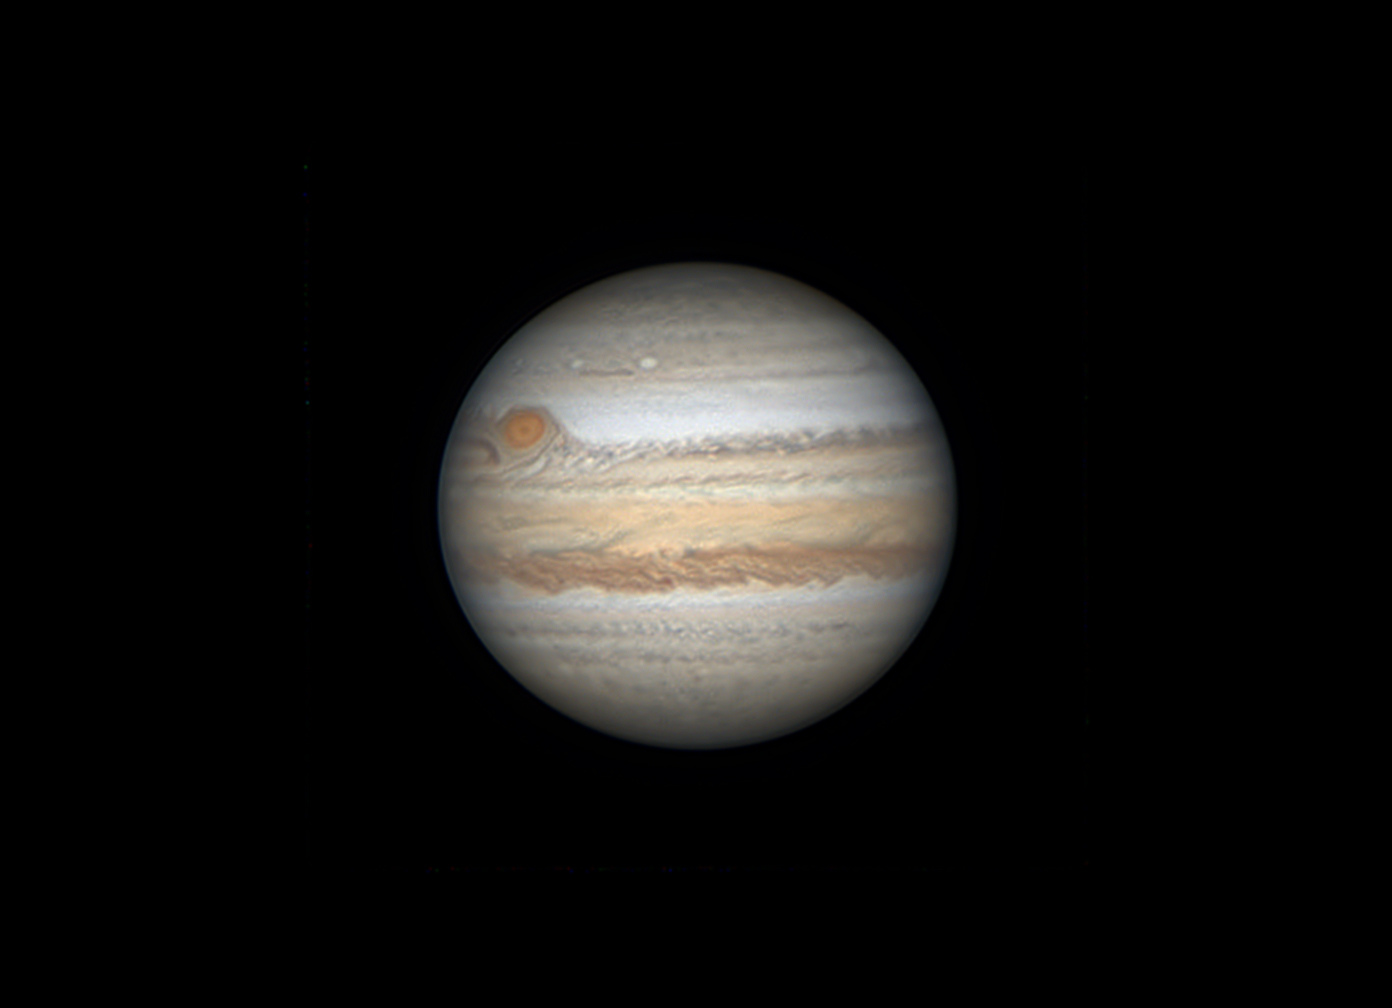 5d091738eec16_Jupiterdu17.jpg.f20c98544d276530cd417e4a0322200f.jpg